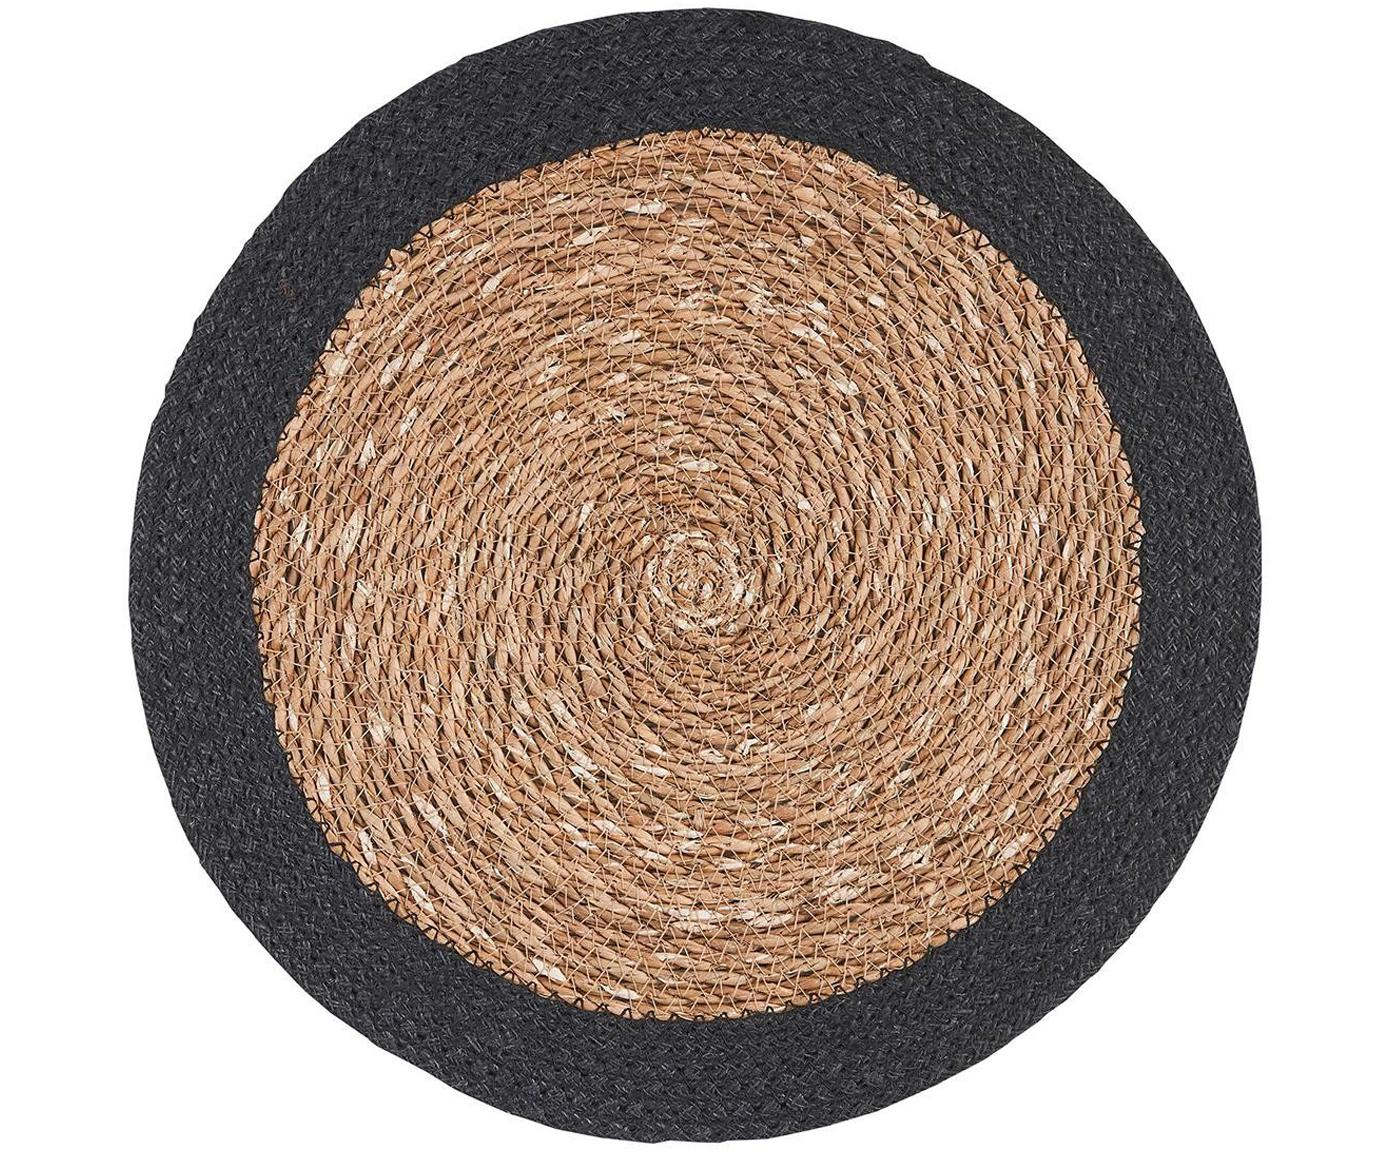 Ronde zeegras placemats Sauvage, 2 stuks, Zeegras, jute, Beige, zwart, Ø 38 cm